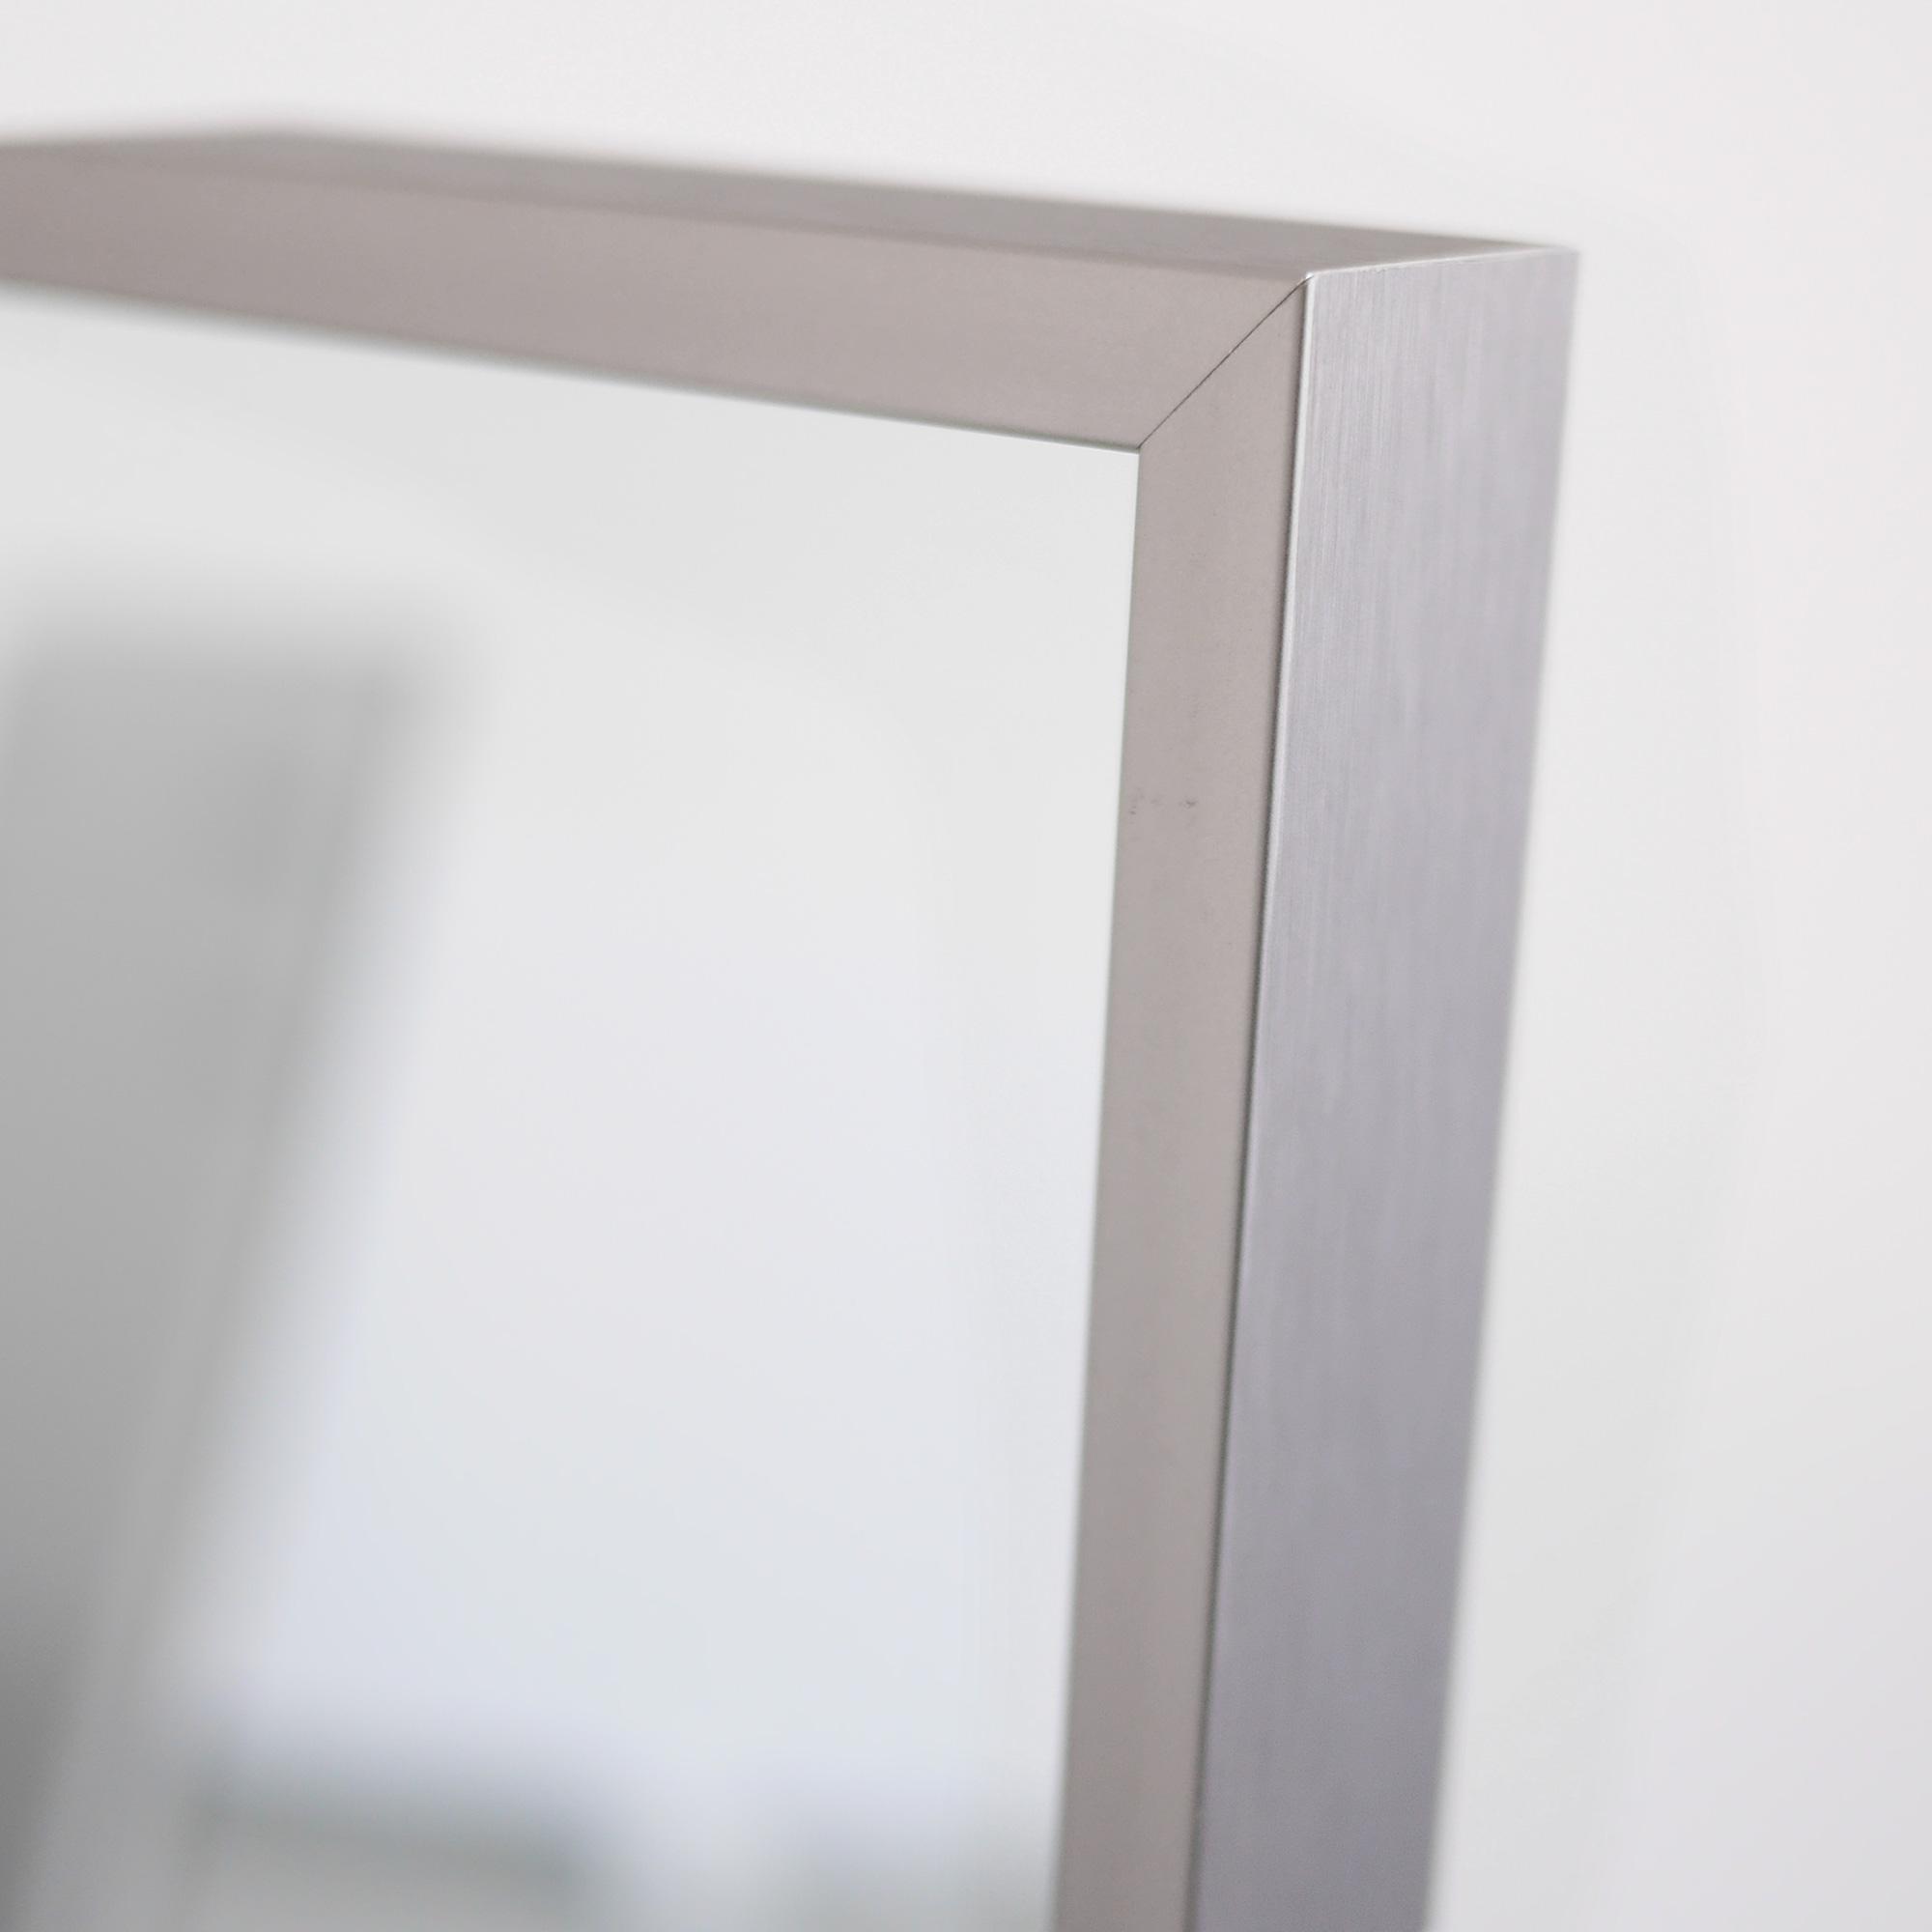 vasner zipris infrarot spiegel neue chrom titan rahmen. Black Bedroom Furniture Sets. Home Design Ideas